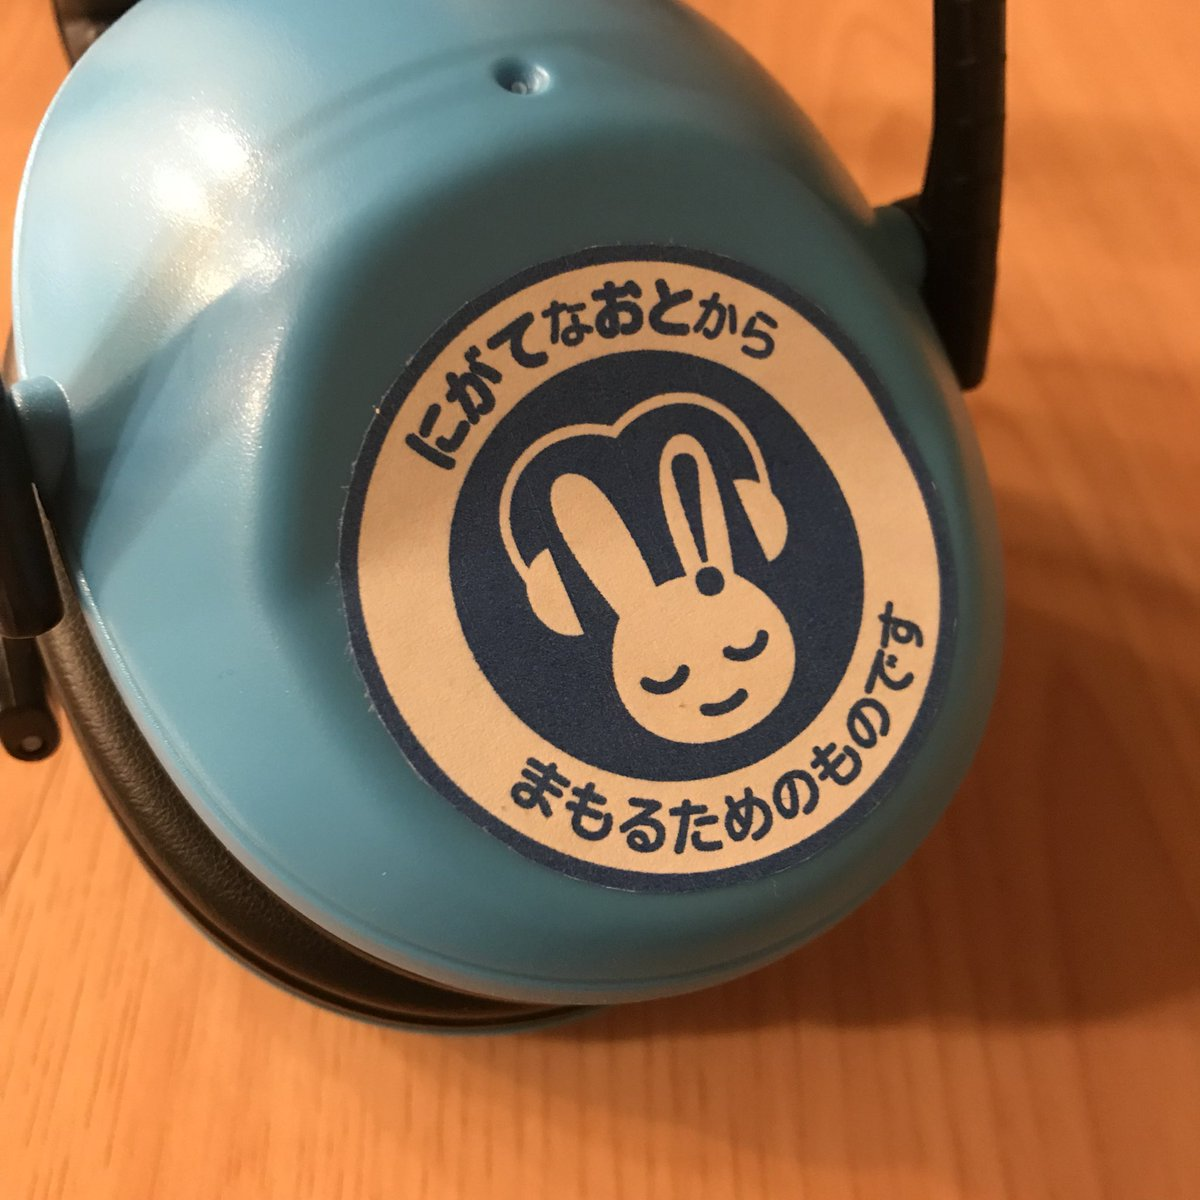 16a4c2b791b8f3 あと、聴覚過敏気味の嬢にイヤーマフ買いました。早速石井マークさん(@ishiimark_sign)の聴覚過敏マークダウンロードして貼り付け。これで明日からの学校生活、少し  ...